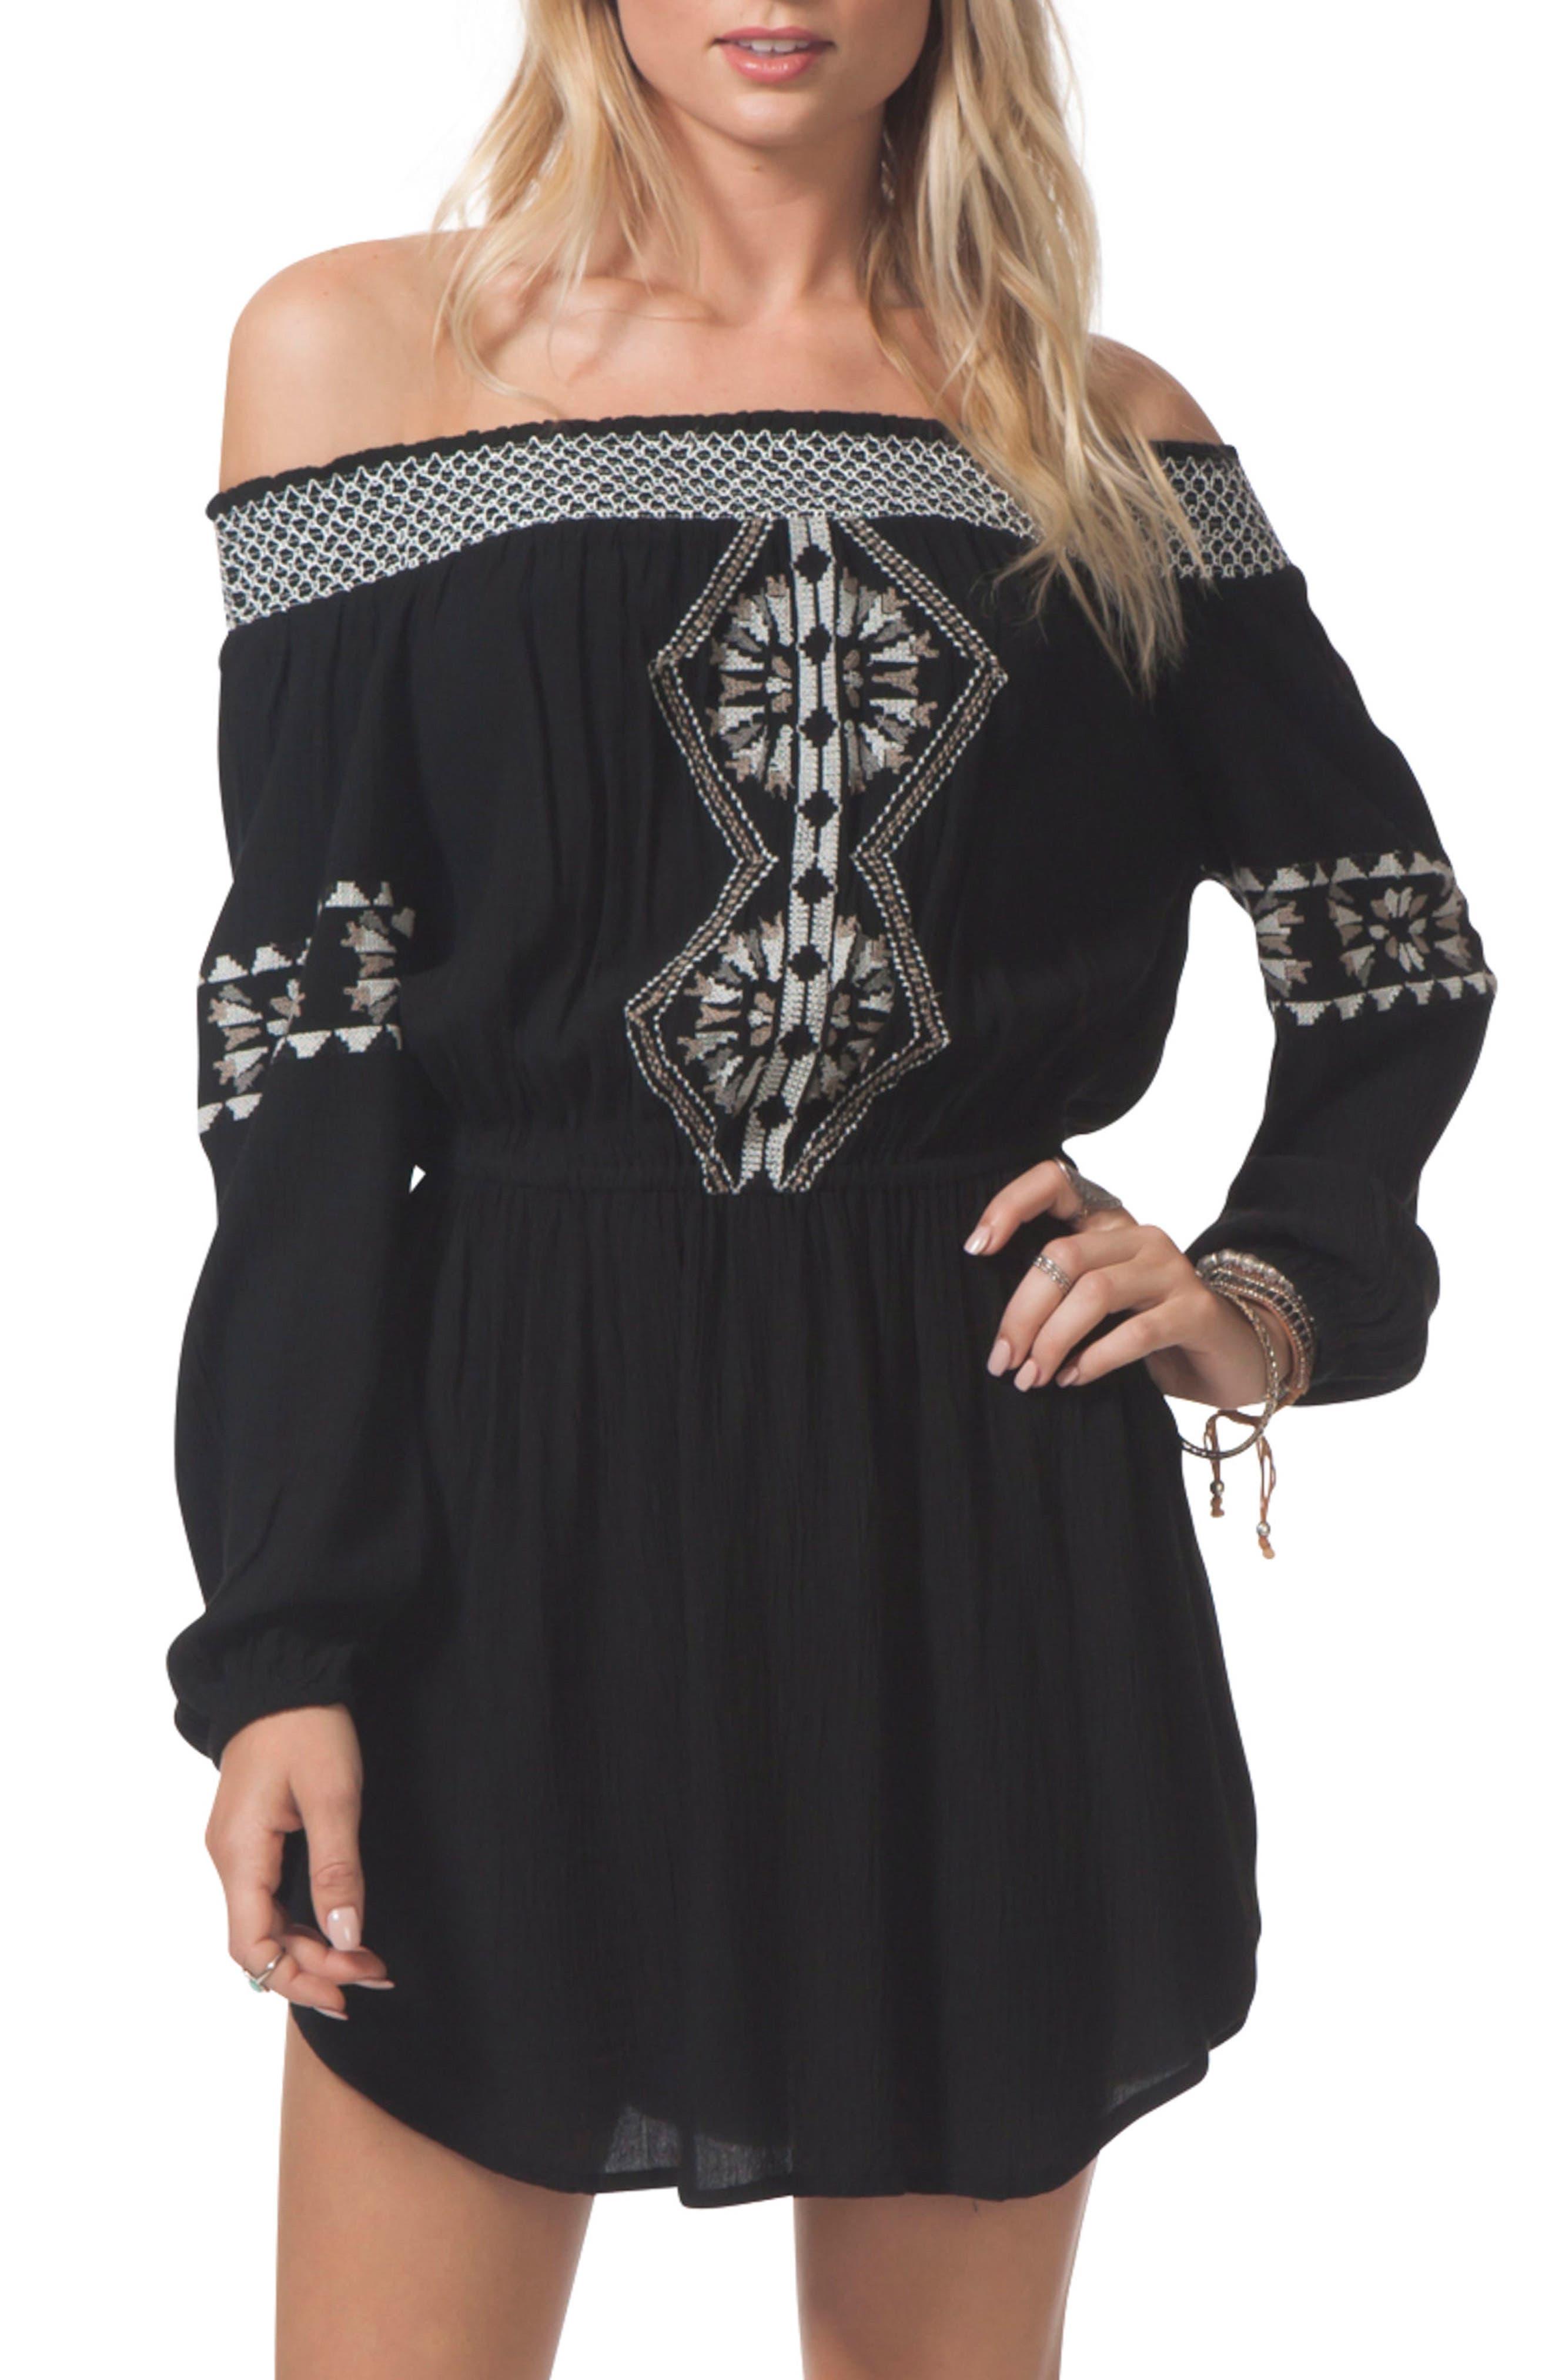 Serena Embroidered Off the Shoulder Dress,                             Main thumbnail 1, color,                             BLACK